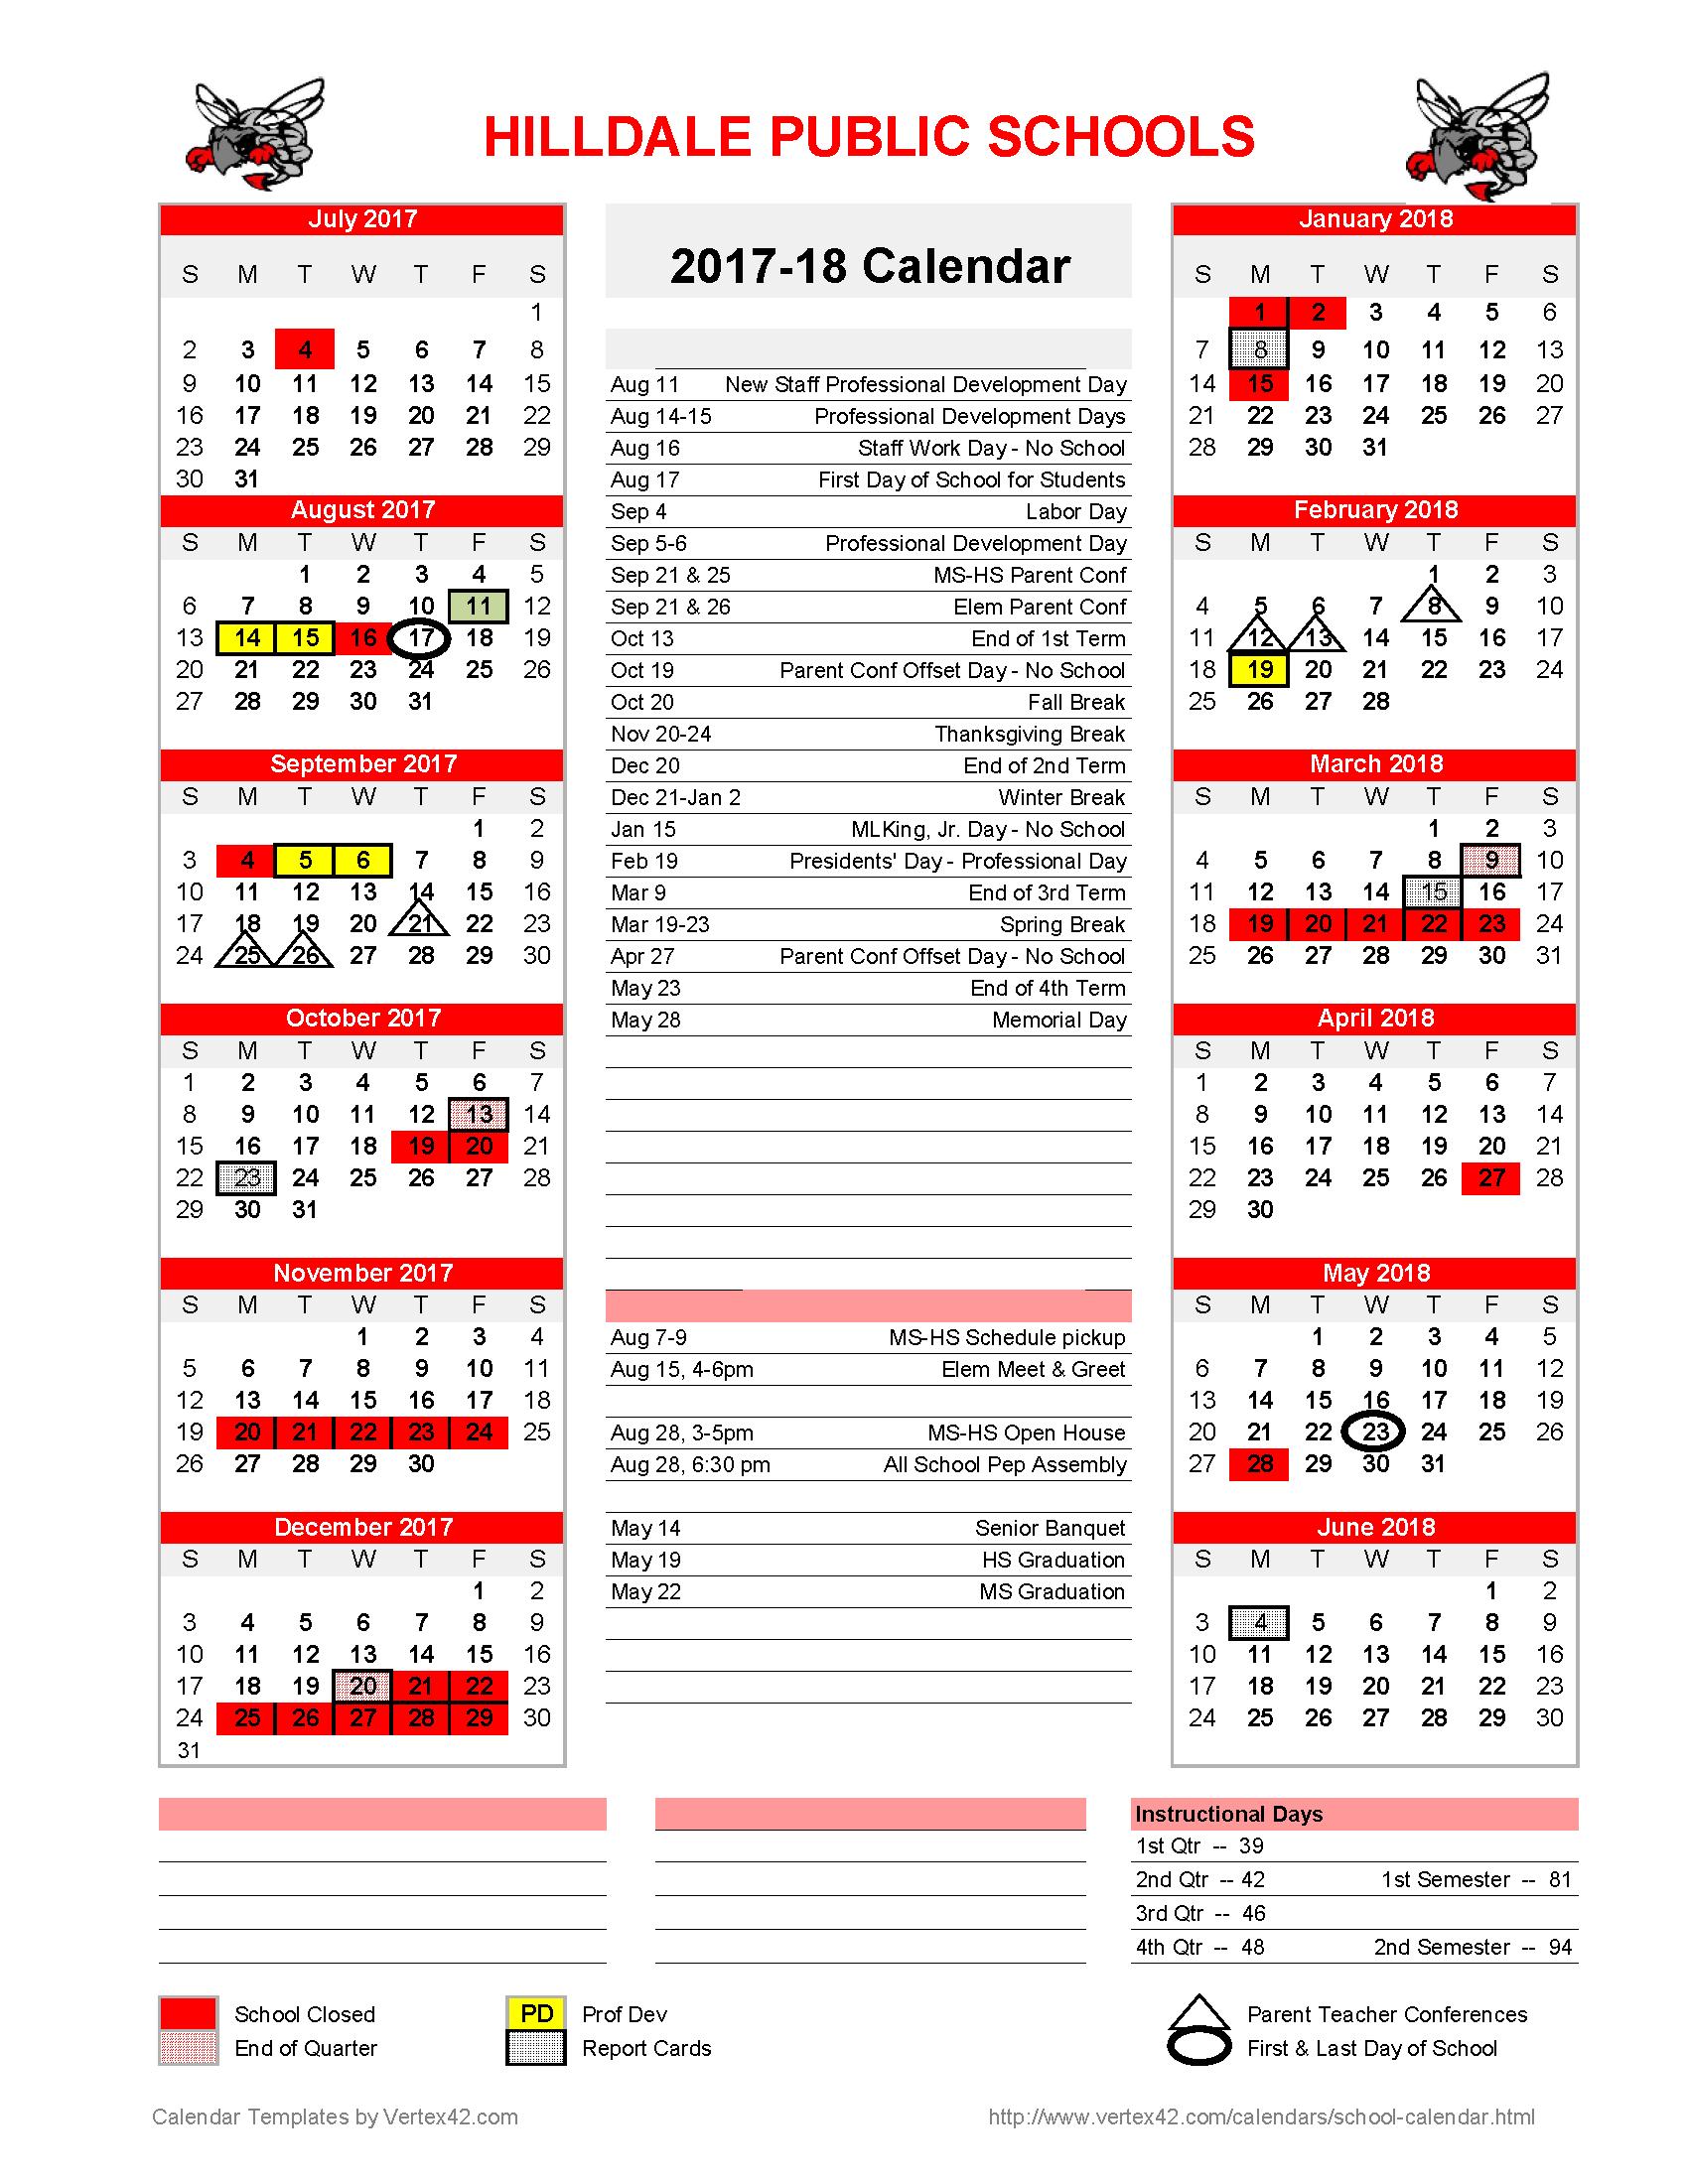 Hilldale Public Schools - 2017-2018 School Calendar